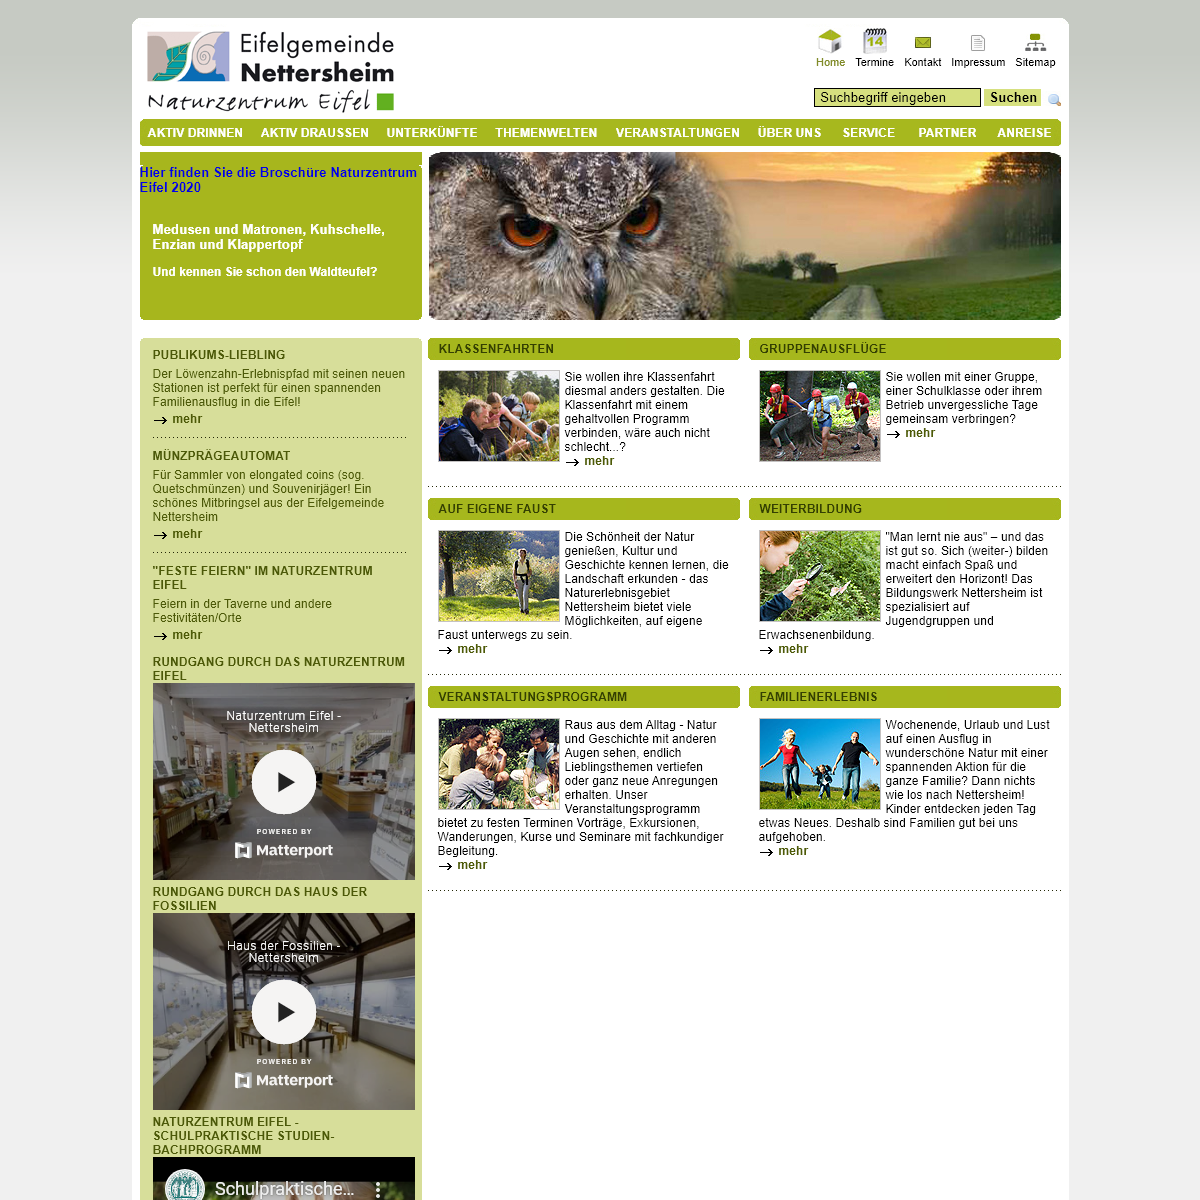 Naturzentrum Eifel in Nettersheim- Home